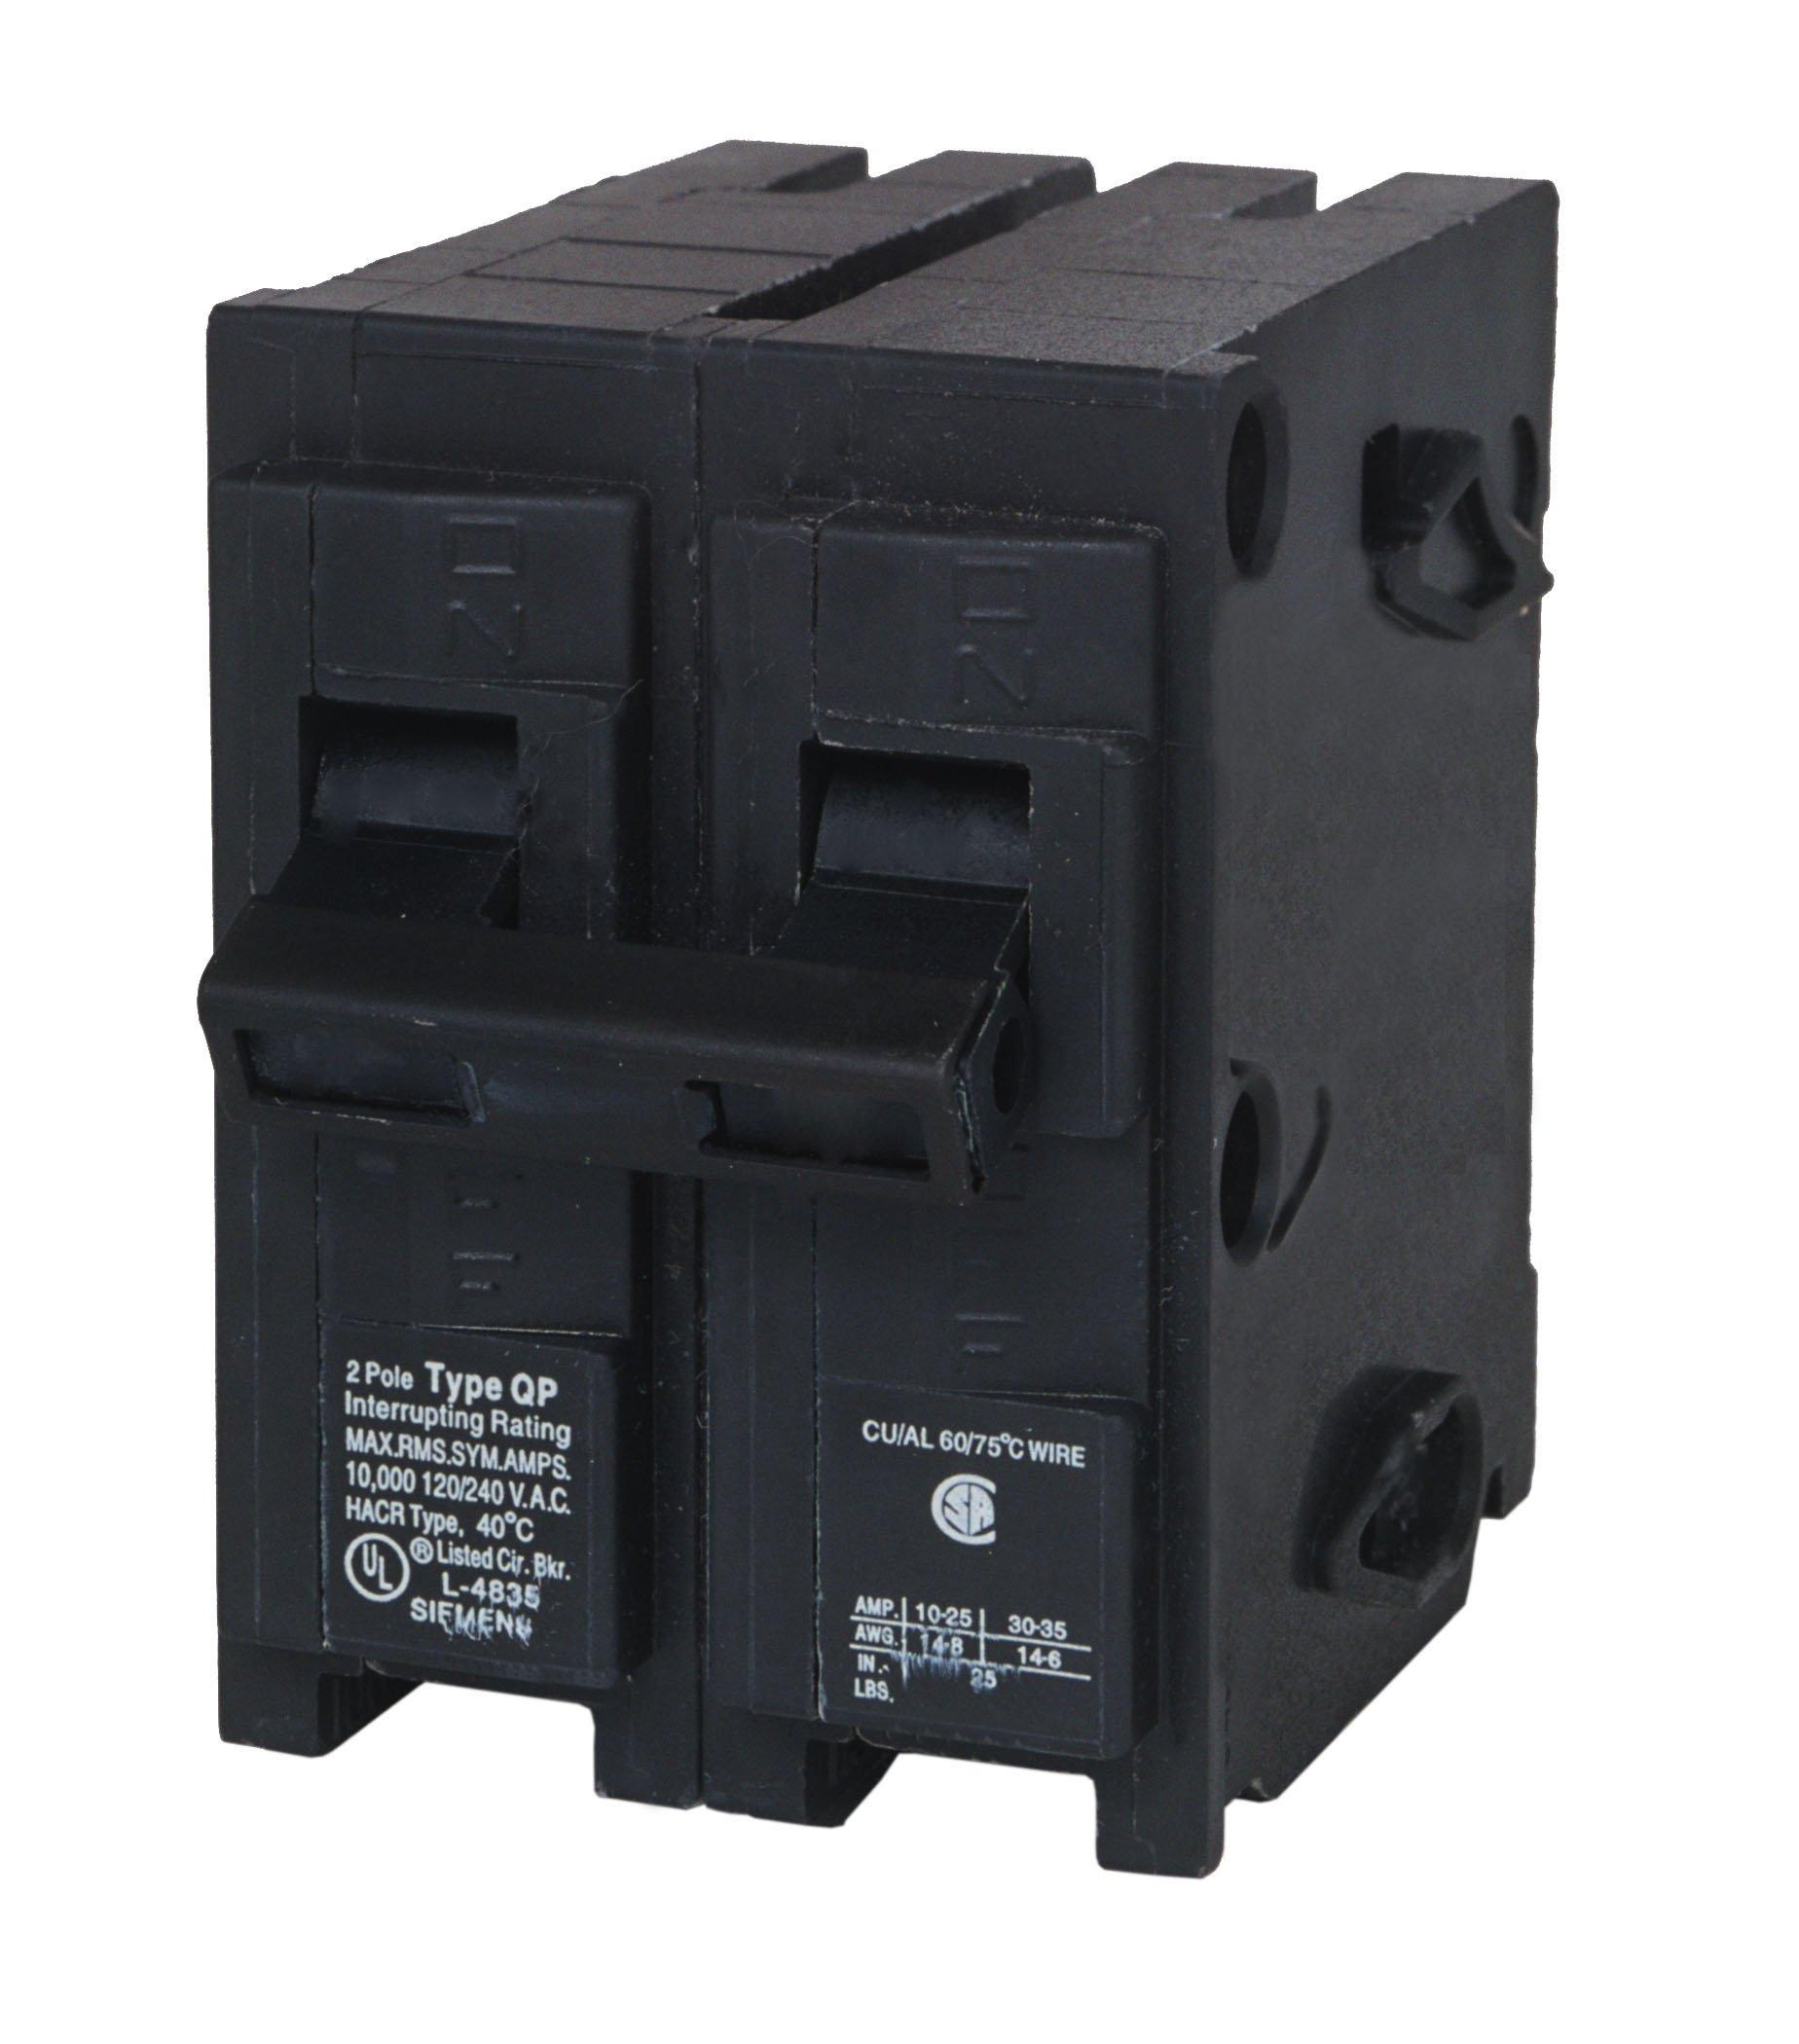 MP225 25-Amp Double Pole Type MP-T Circuit Breaker